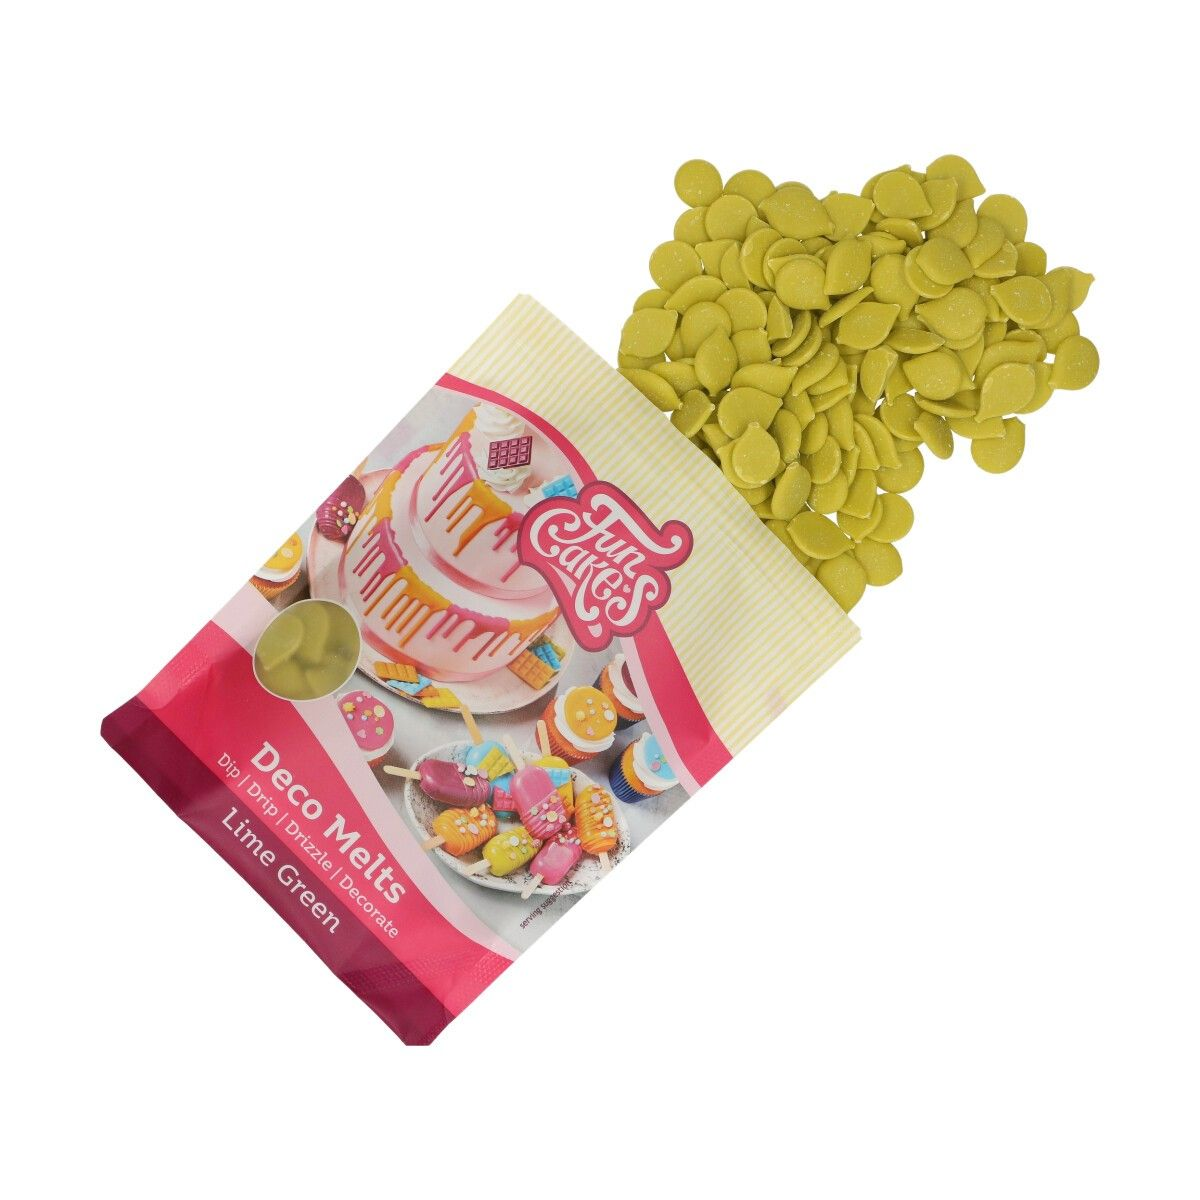 Funcakes Deco Melts Limettengrün 250 g